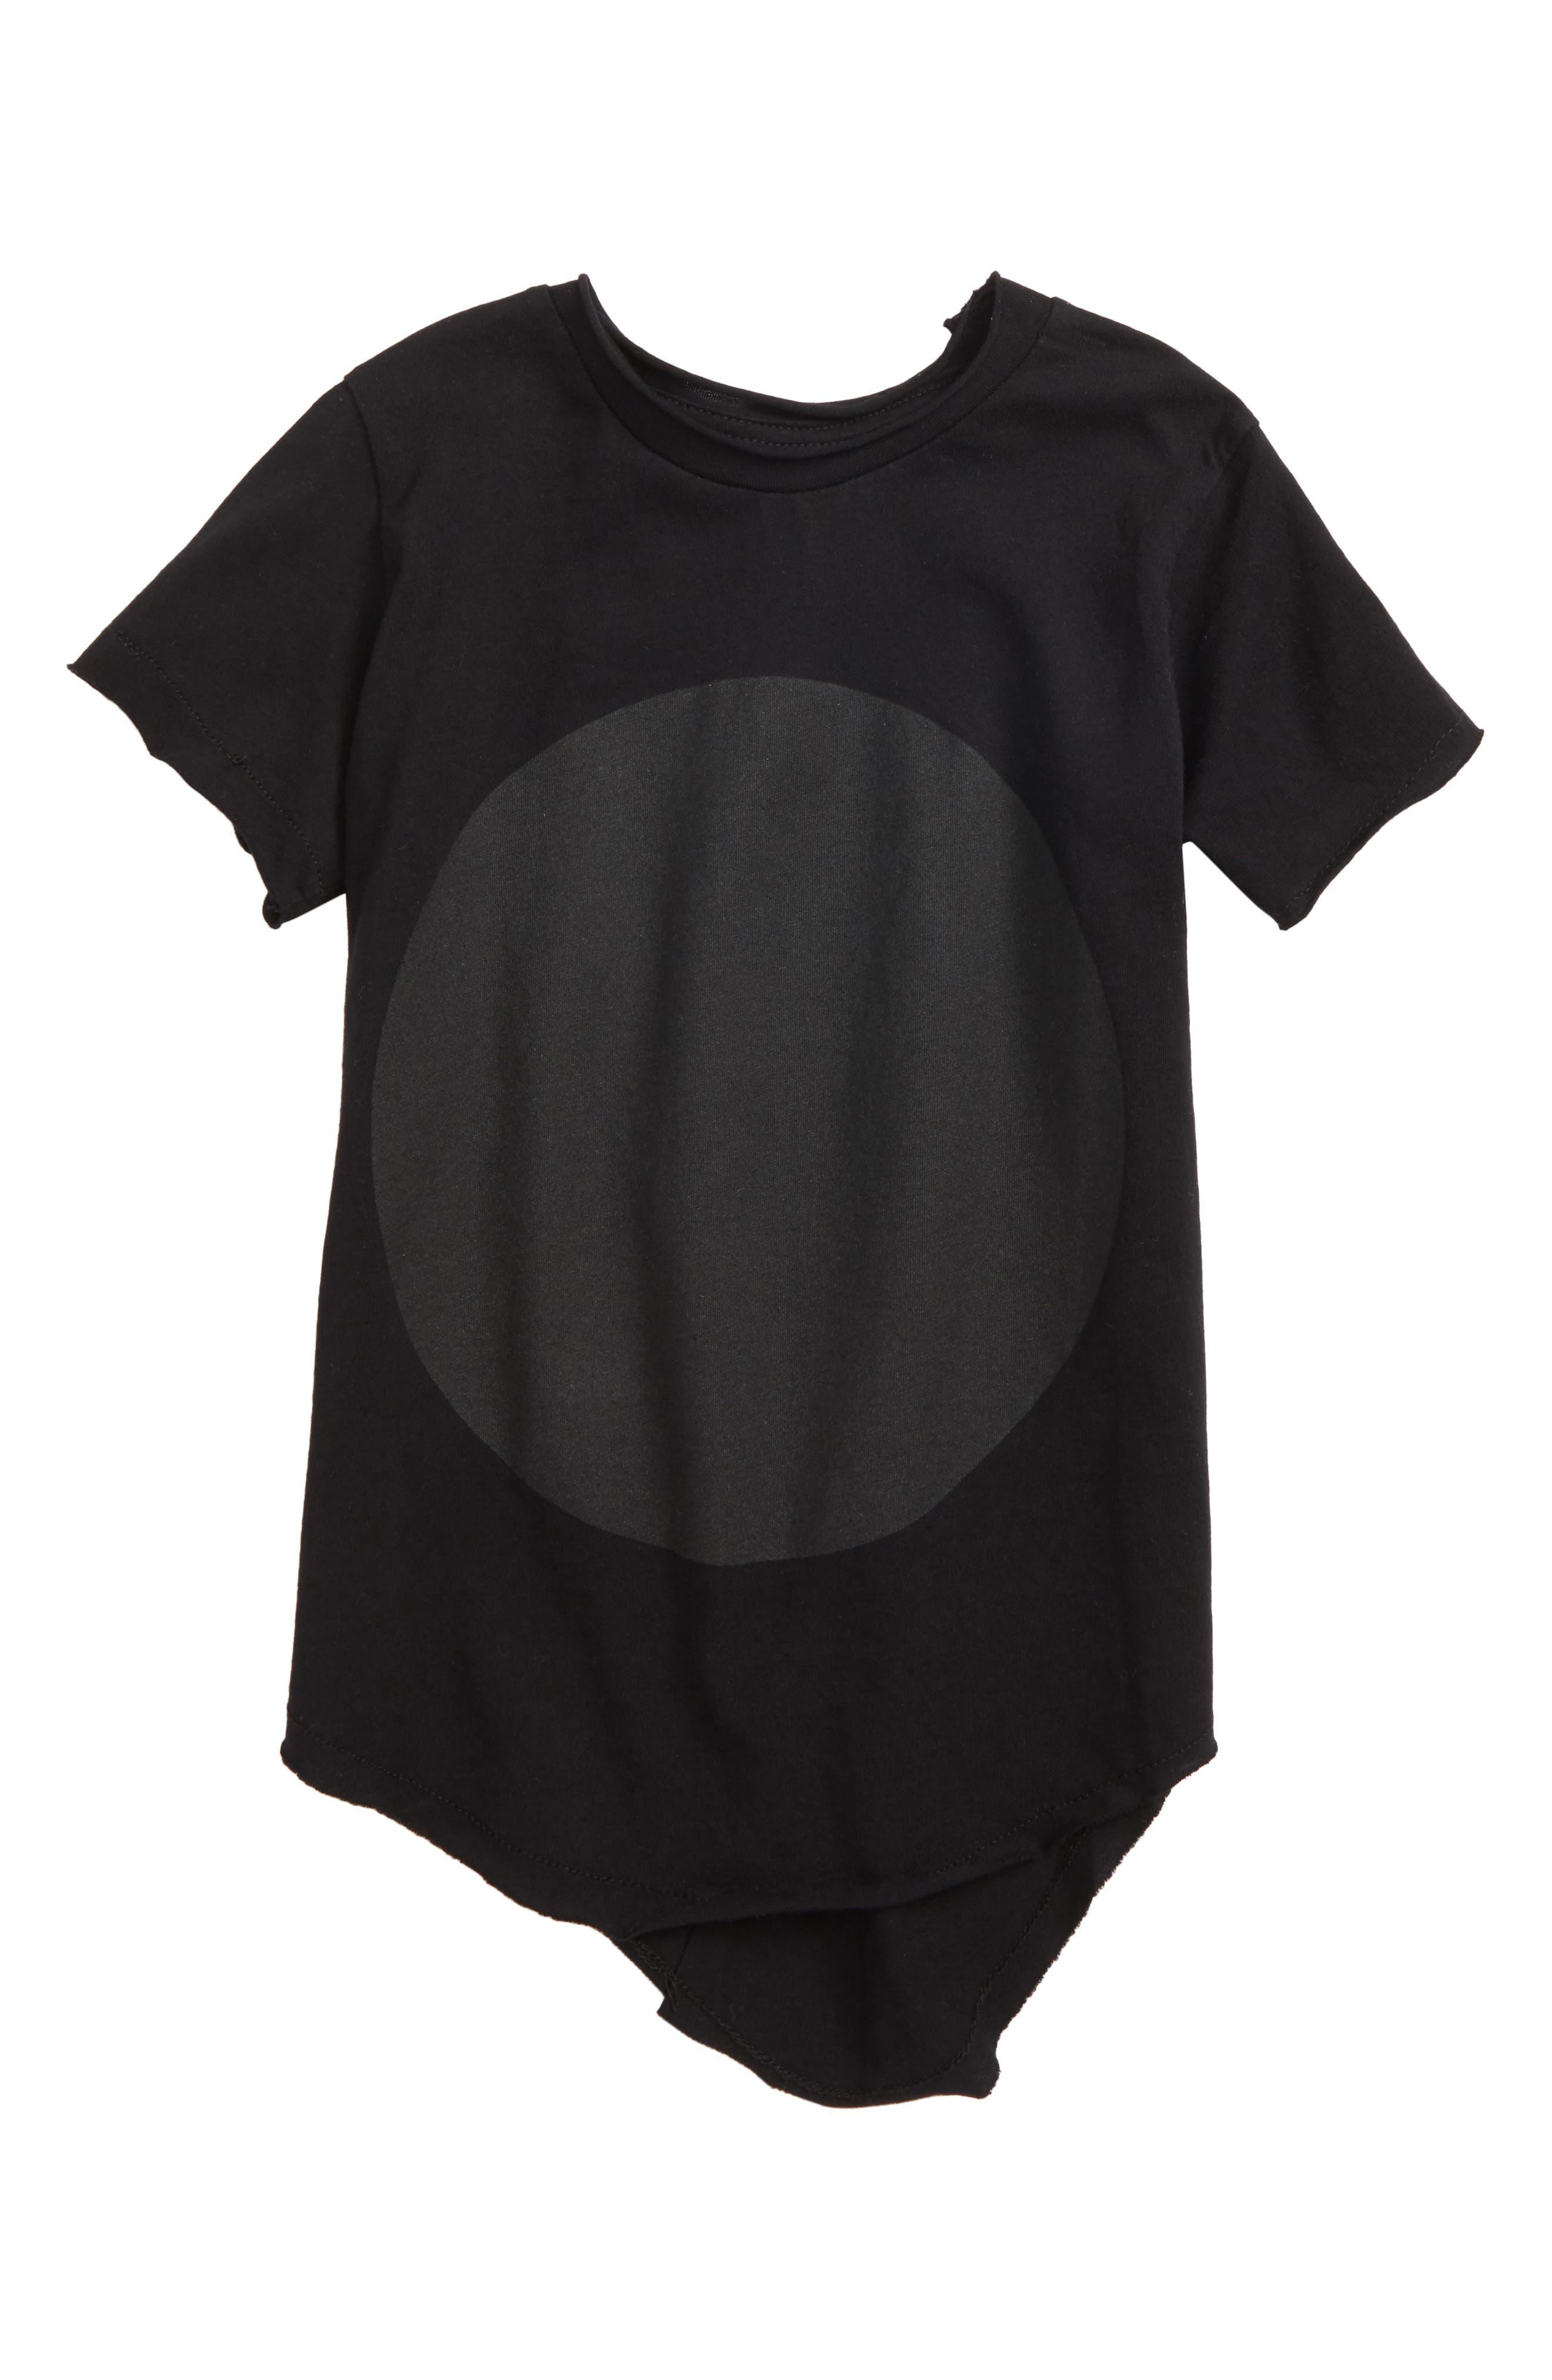 Main Image - Nununu Circle Graphic Shirt (Baby)